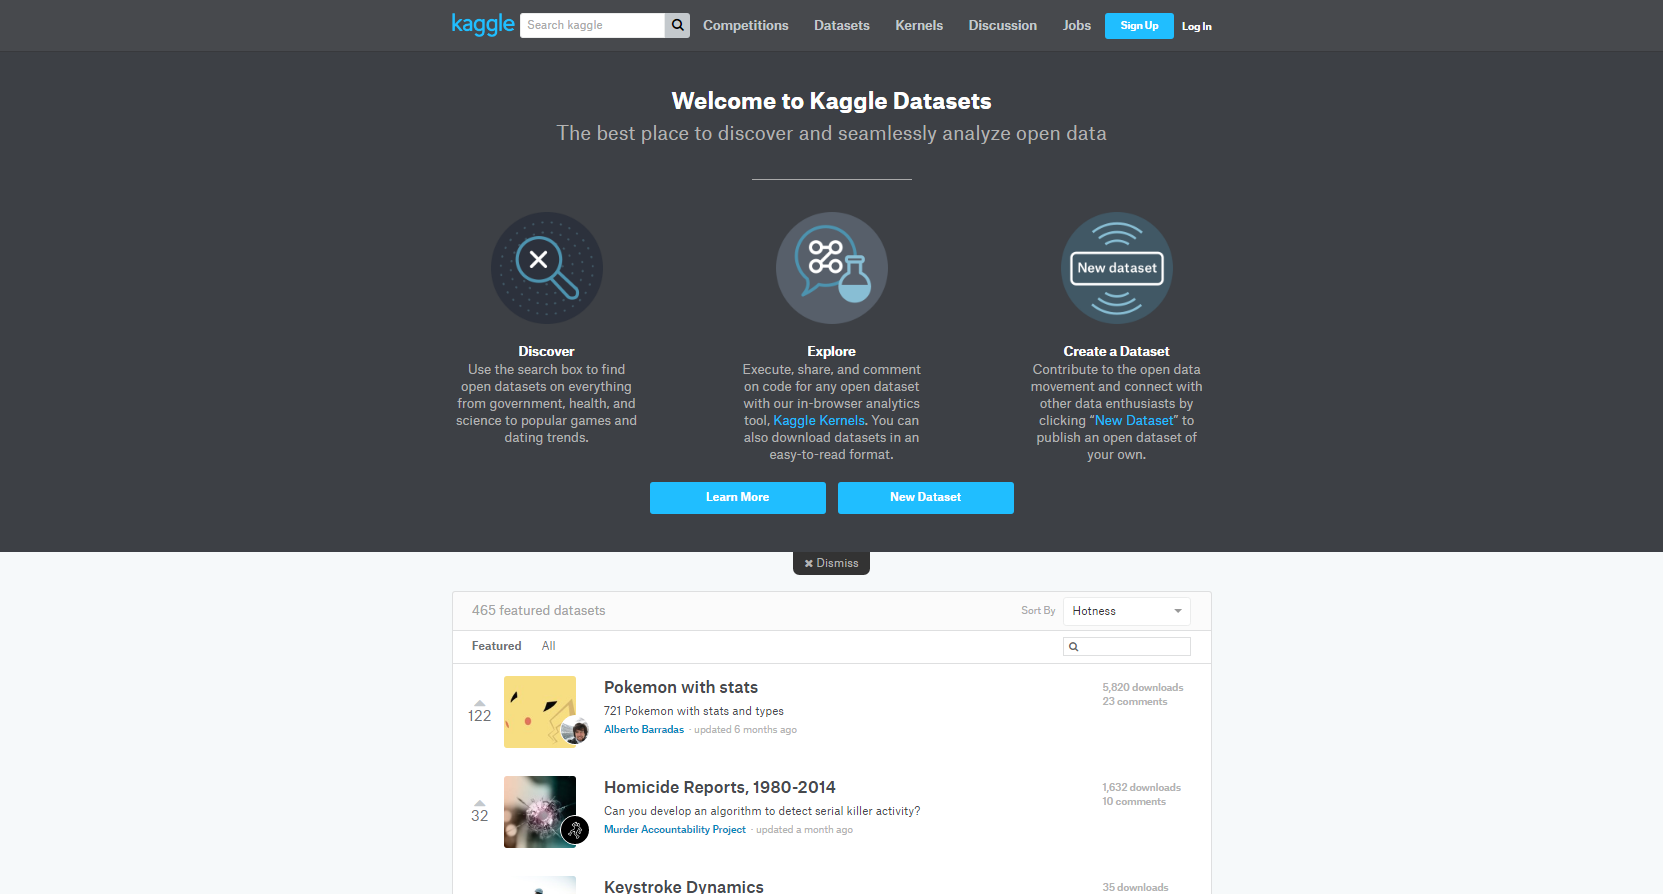 Datasets de Kaggle